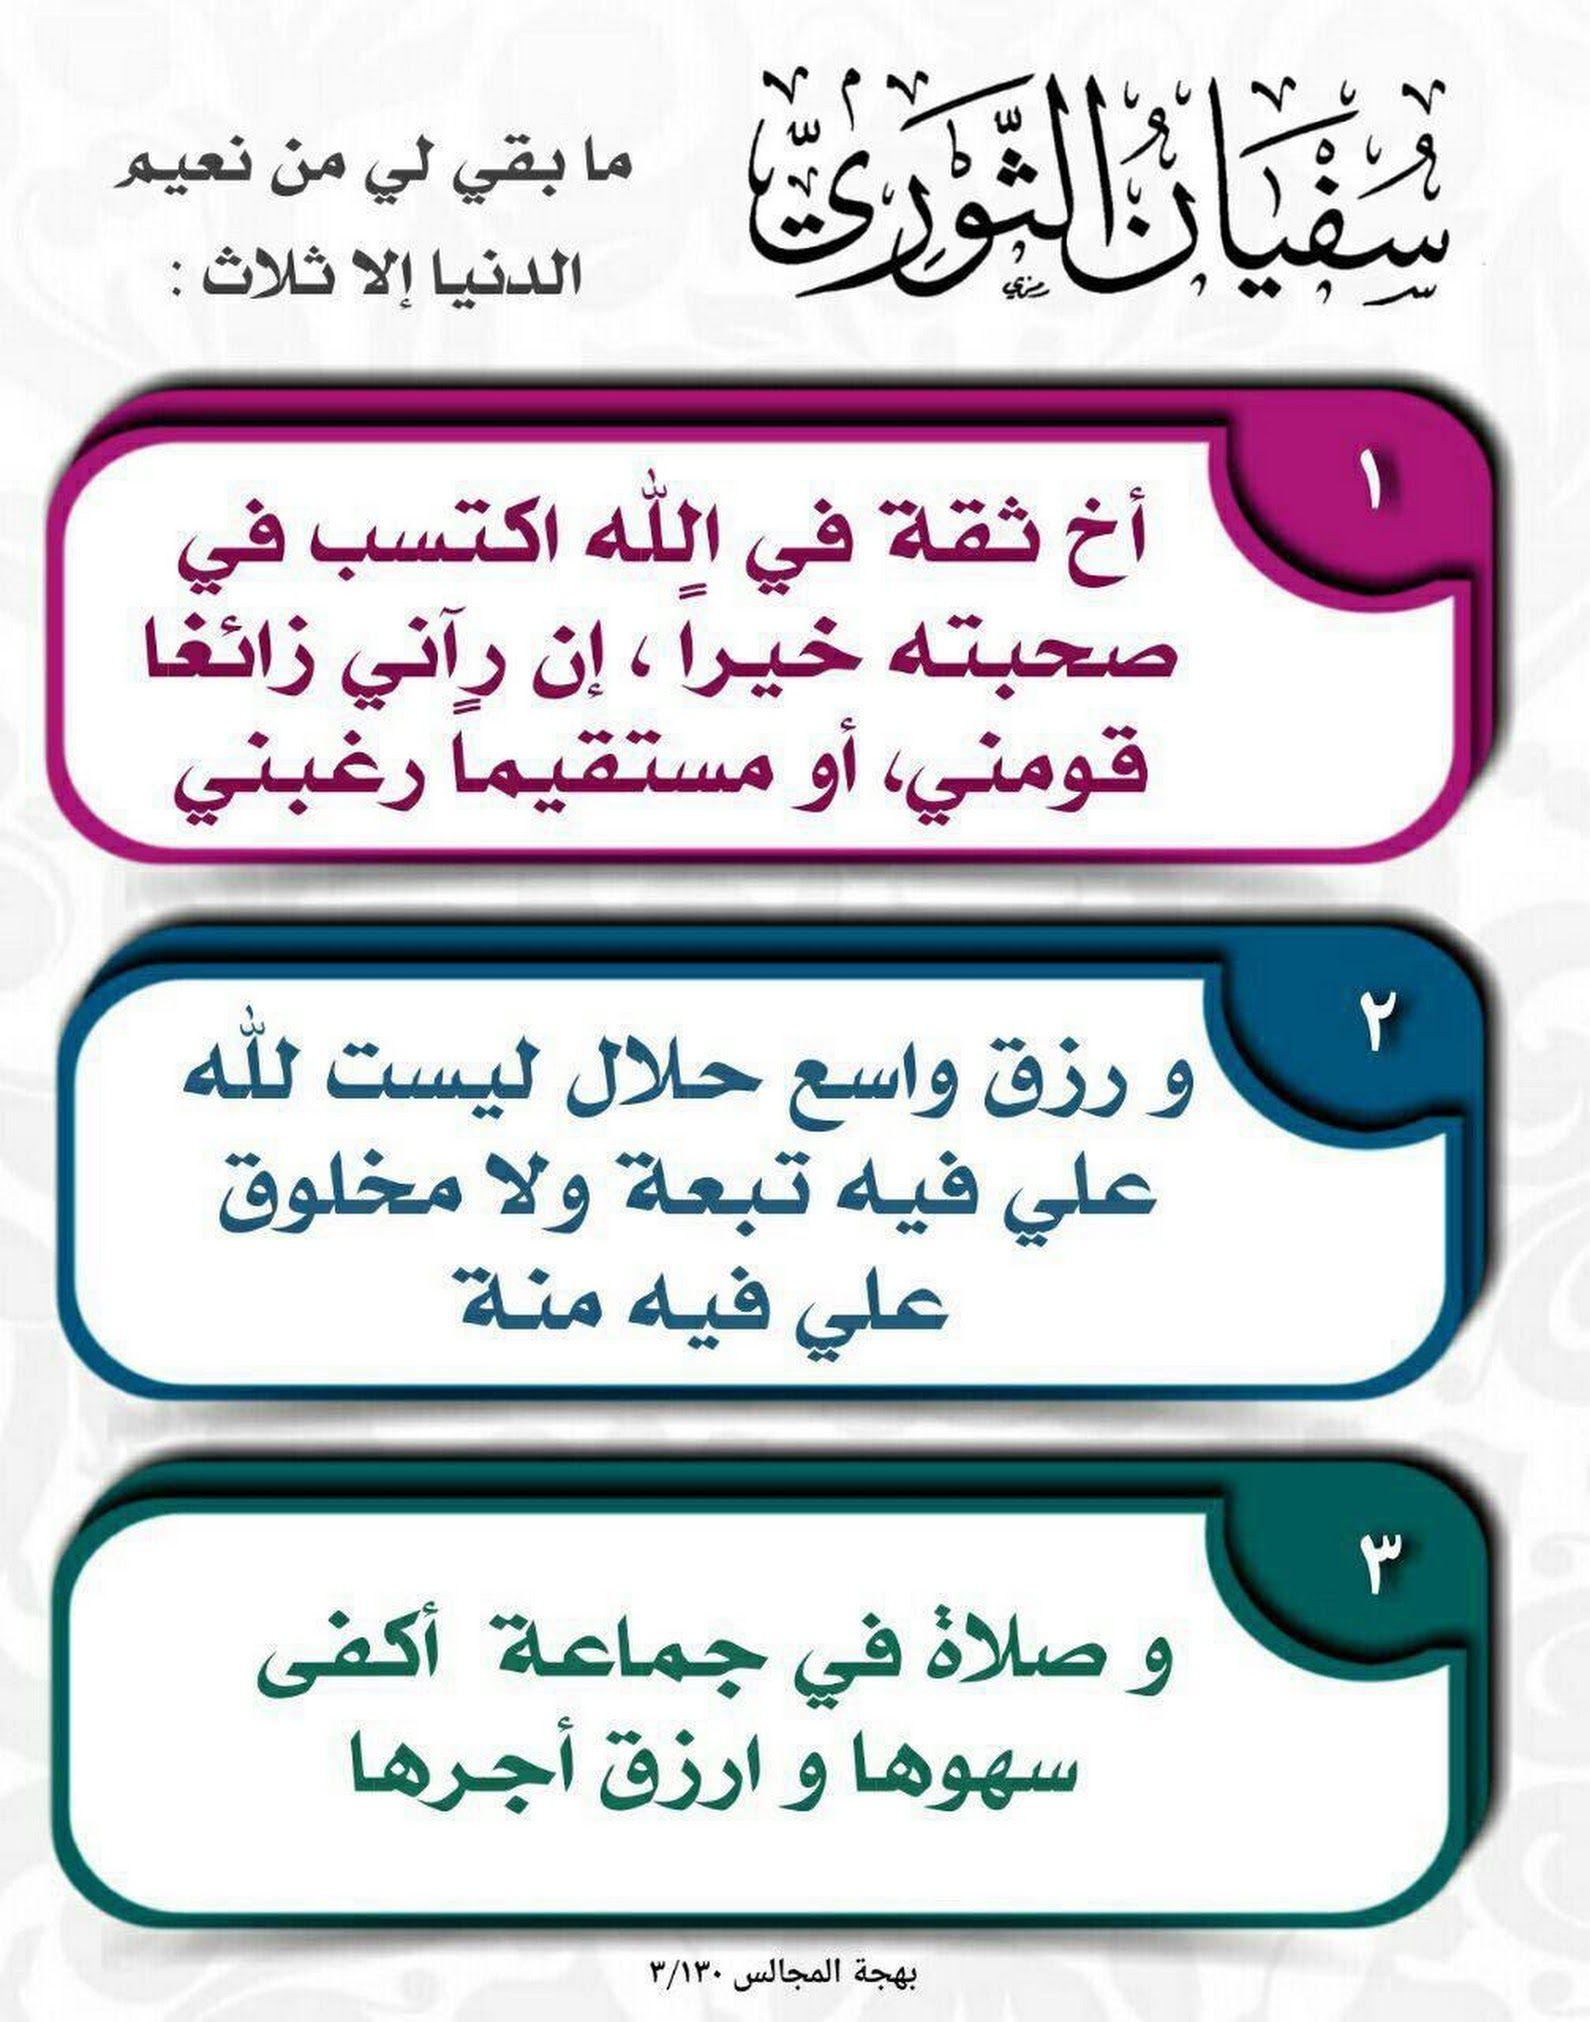 Pin By الأثر الجميل On أقوال الصحابة والعلماء Muslim Quotes Islam Quotes